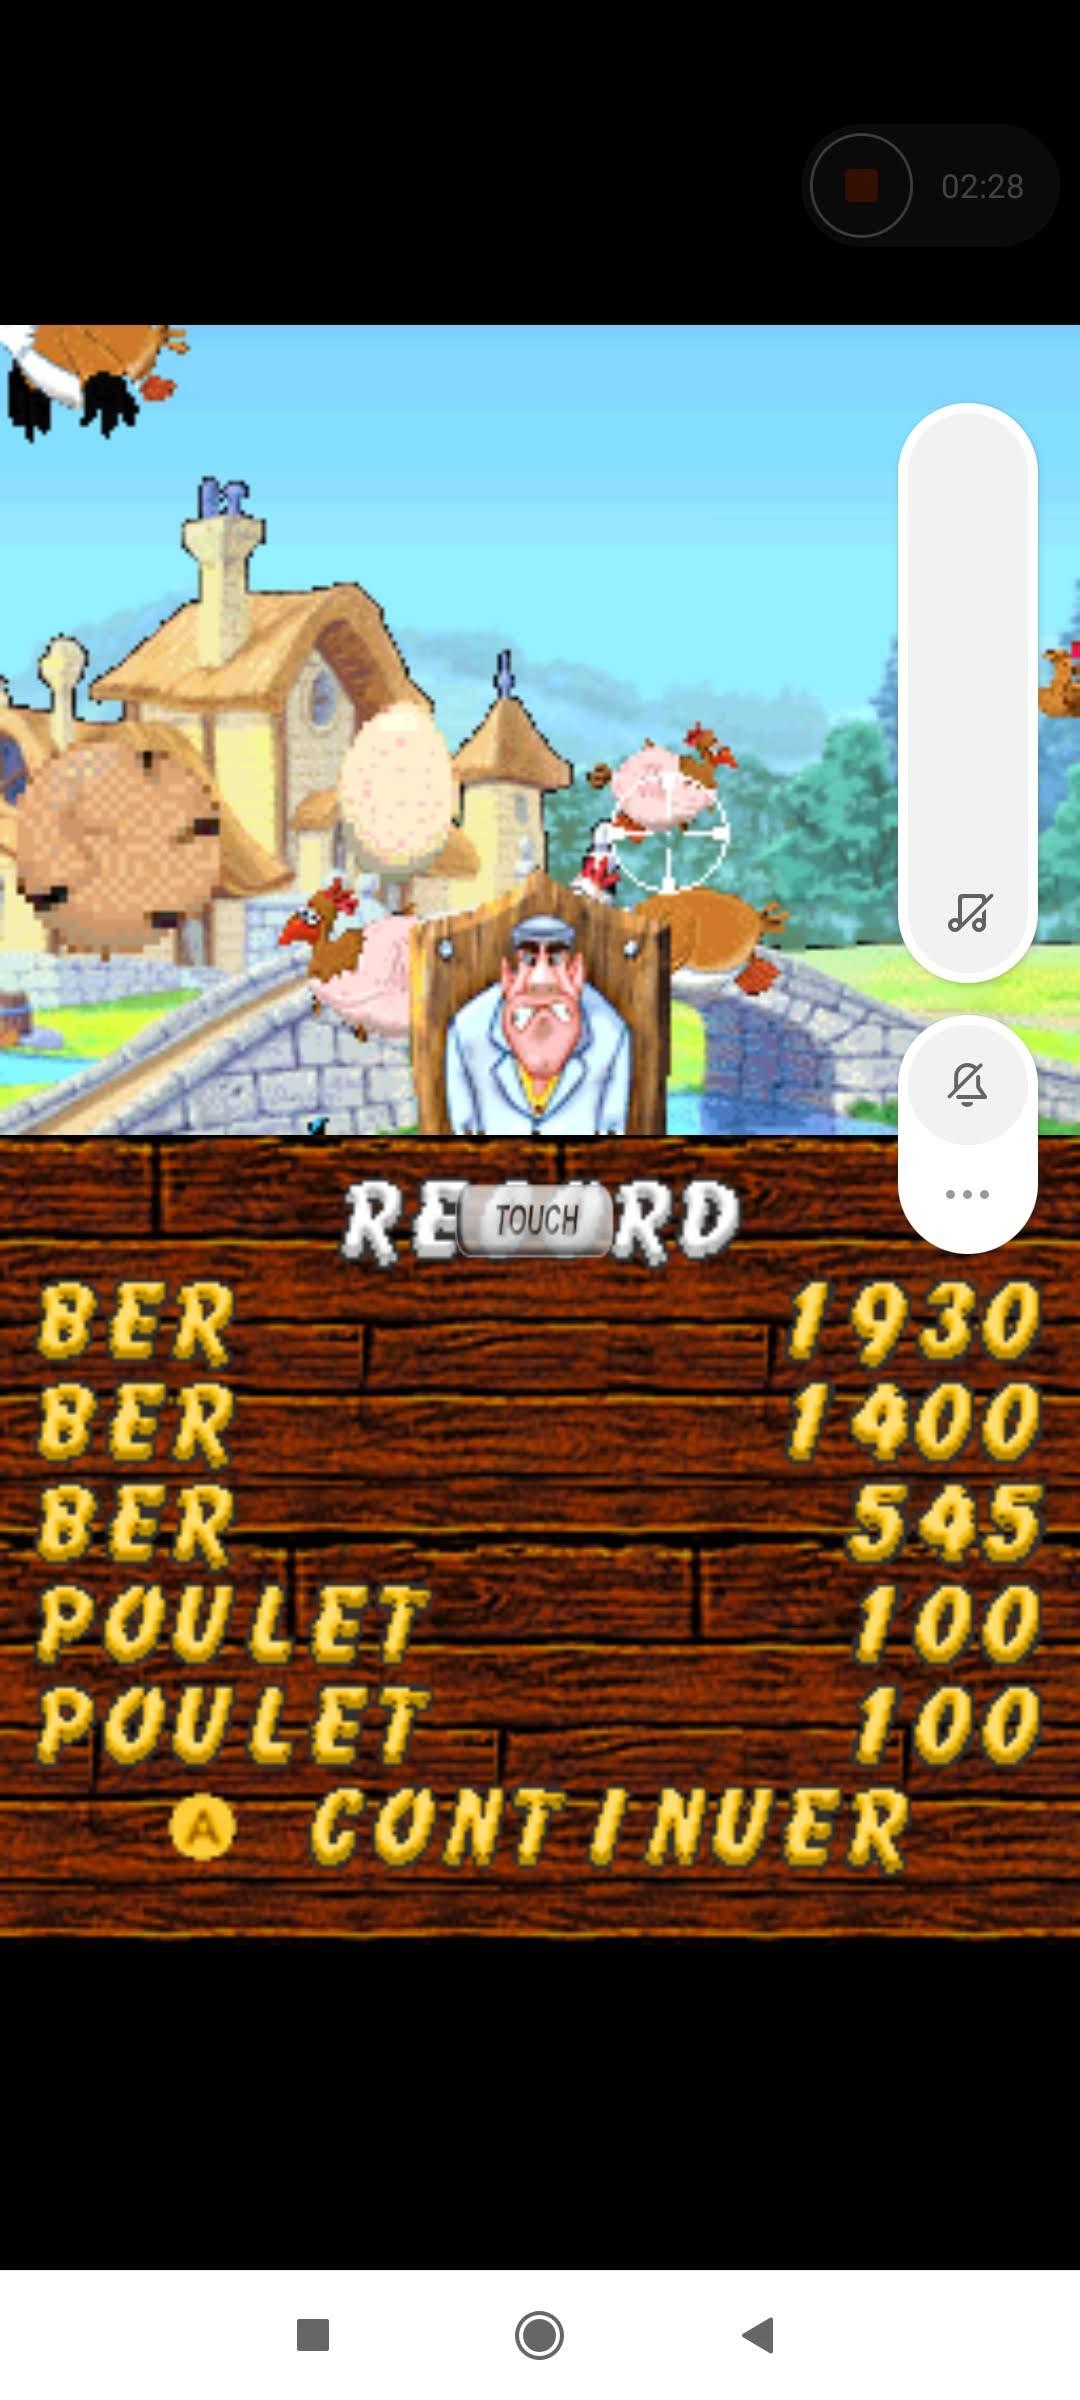 Larquey: Chicken Shoot [Arcade: Hard] (Nintendo DS Emulated) 545 points on 2020-09-27 04:53:40